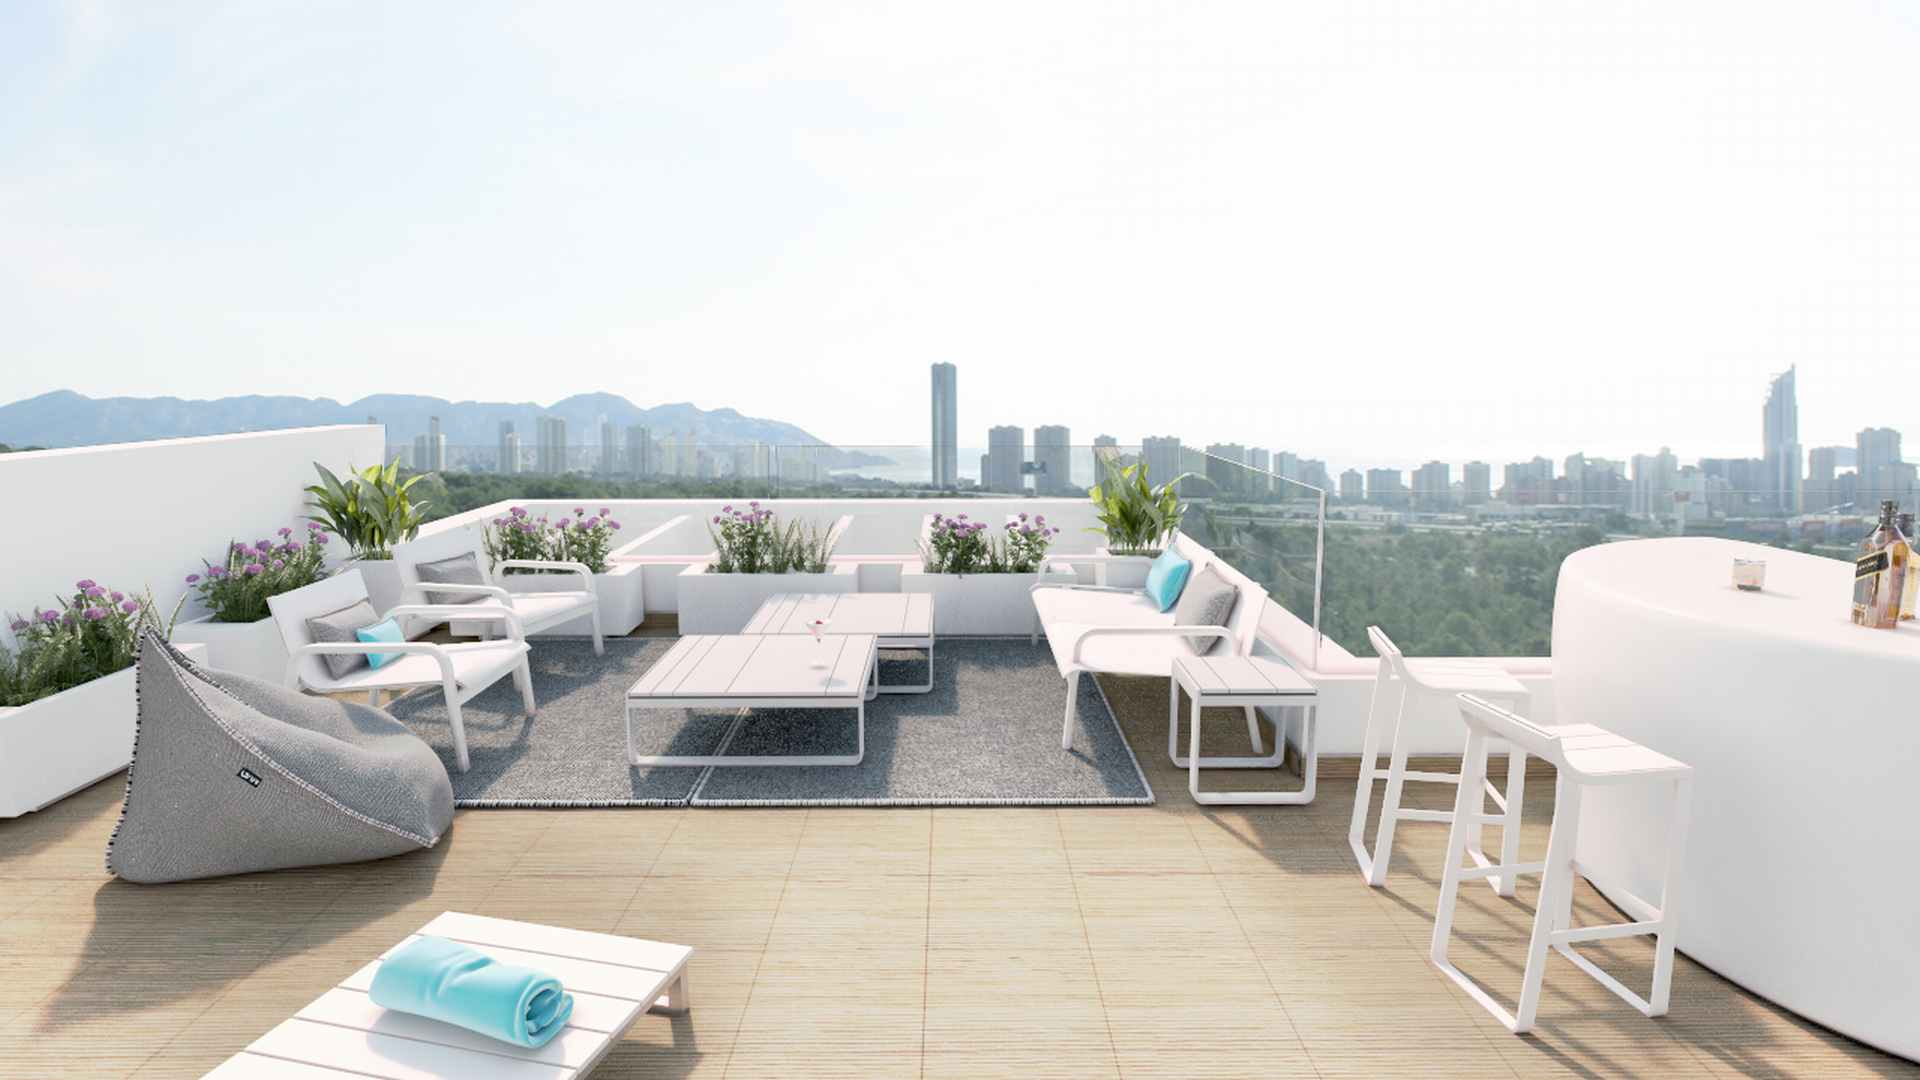 villa-aqua-property-for-sale-benidorm-campana-garden-3